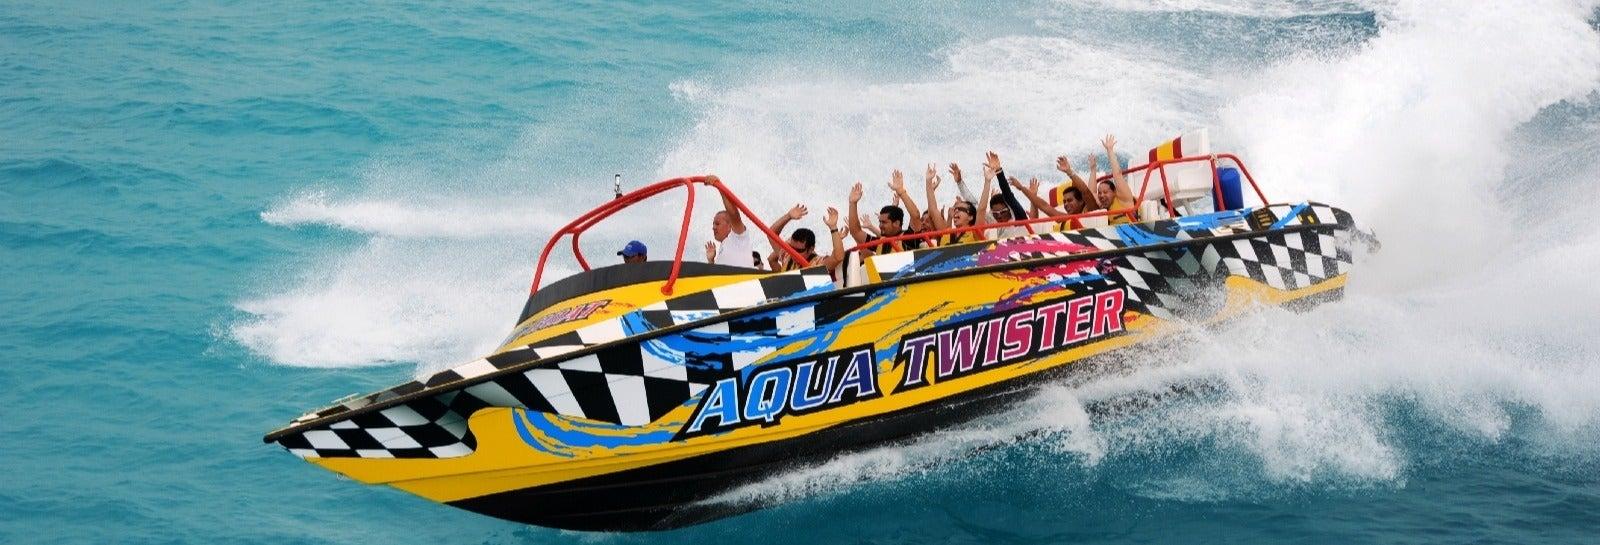 Experiência Jet Boat em Cancún